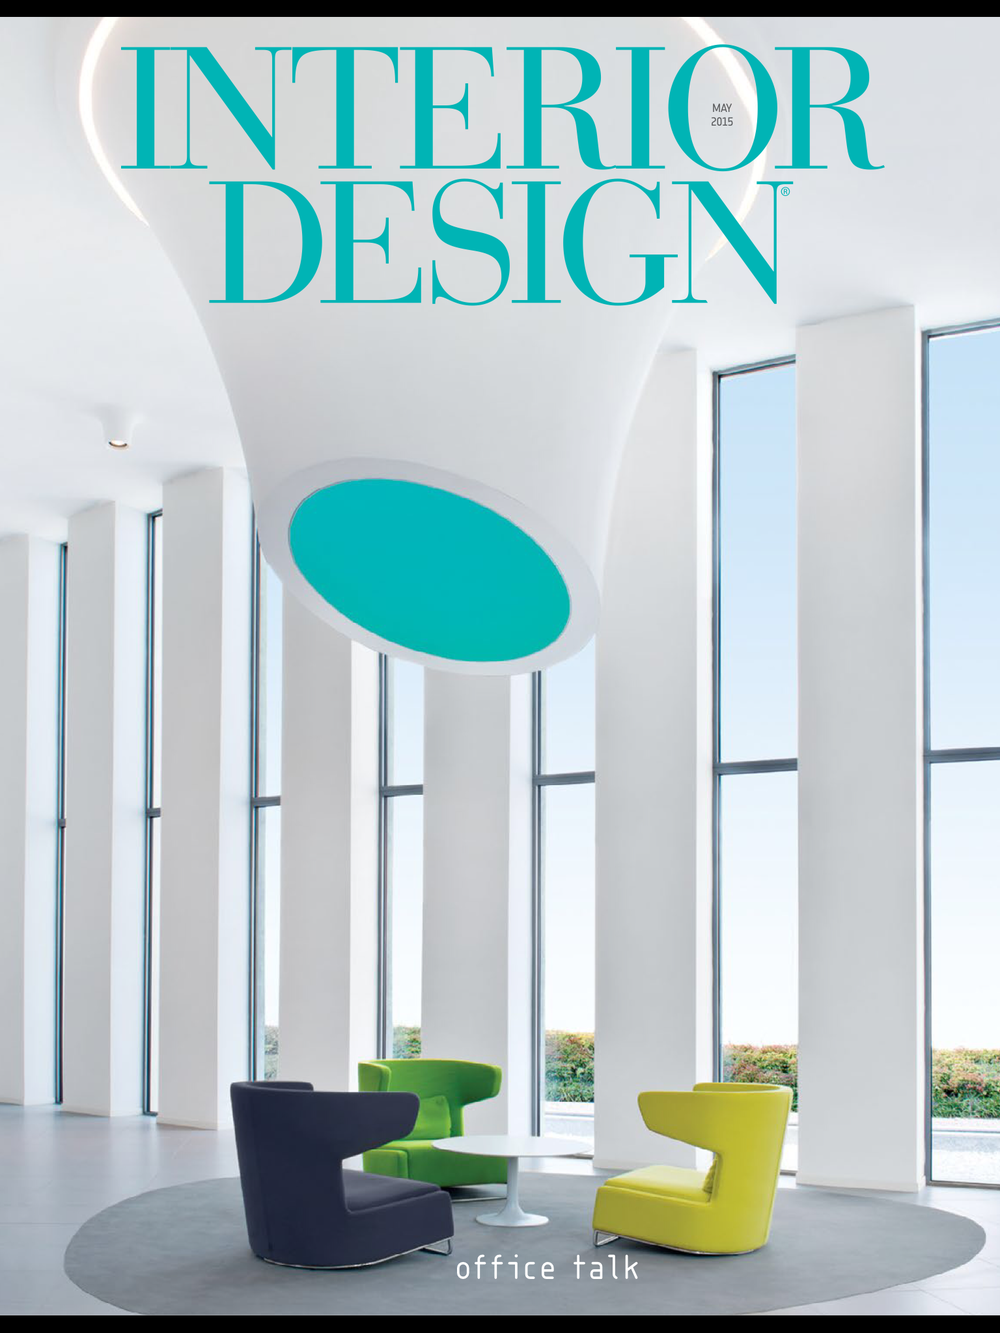 Based Upon_London_Art Design_Press_Interior Design US